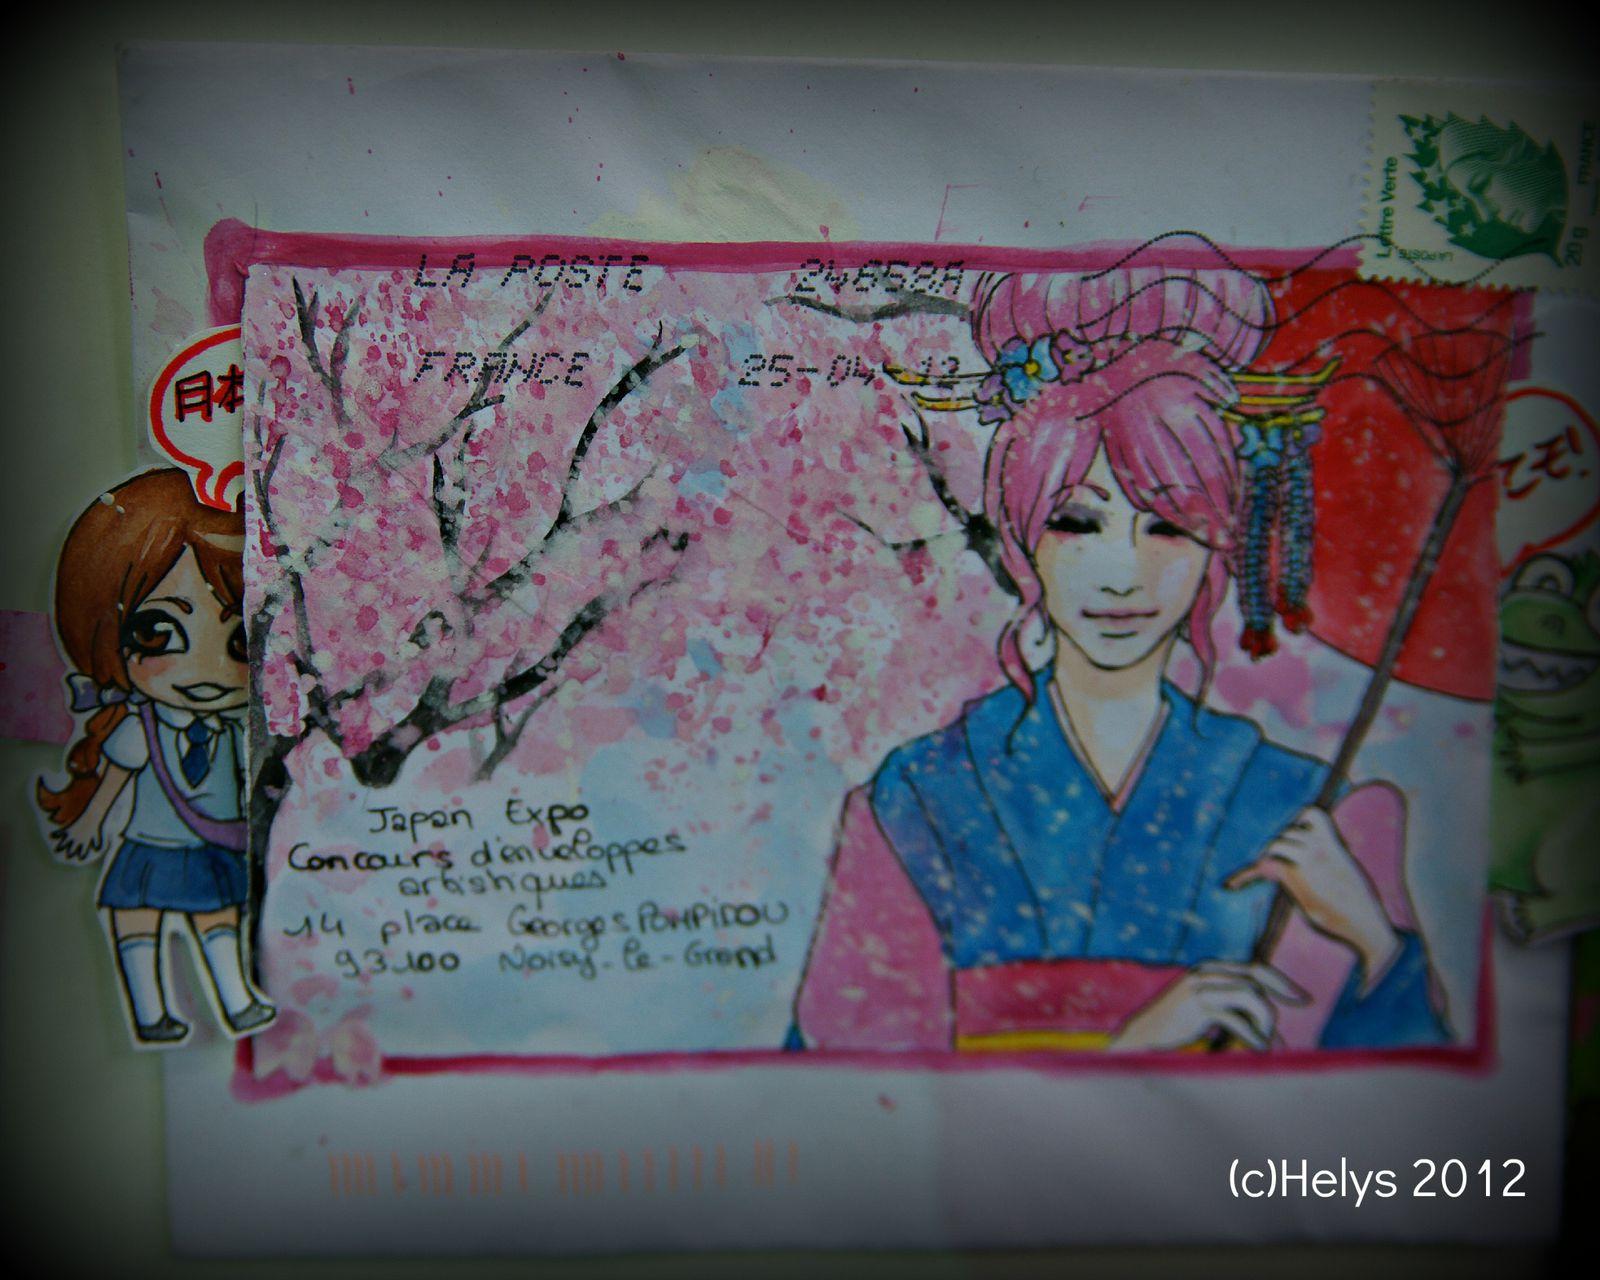 Japan expo 2012: Enveloppes artistiques 2/2